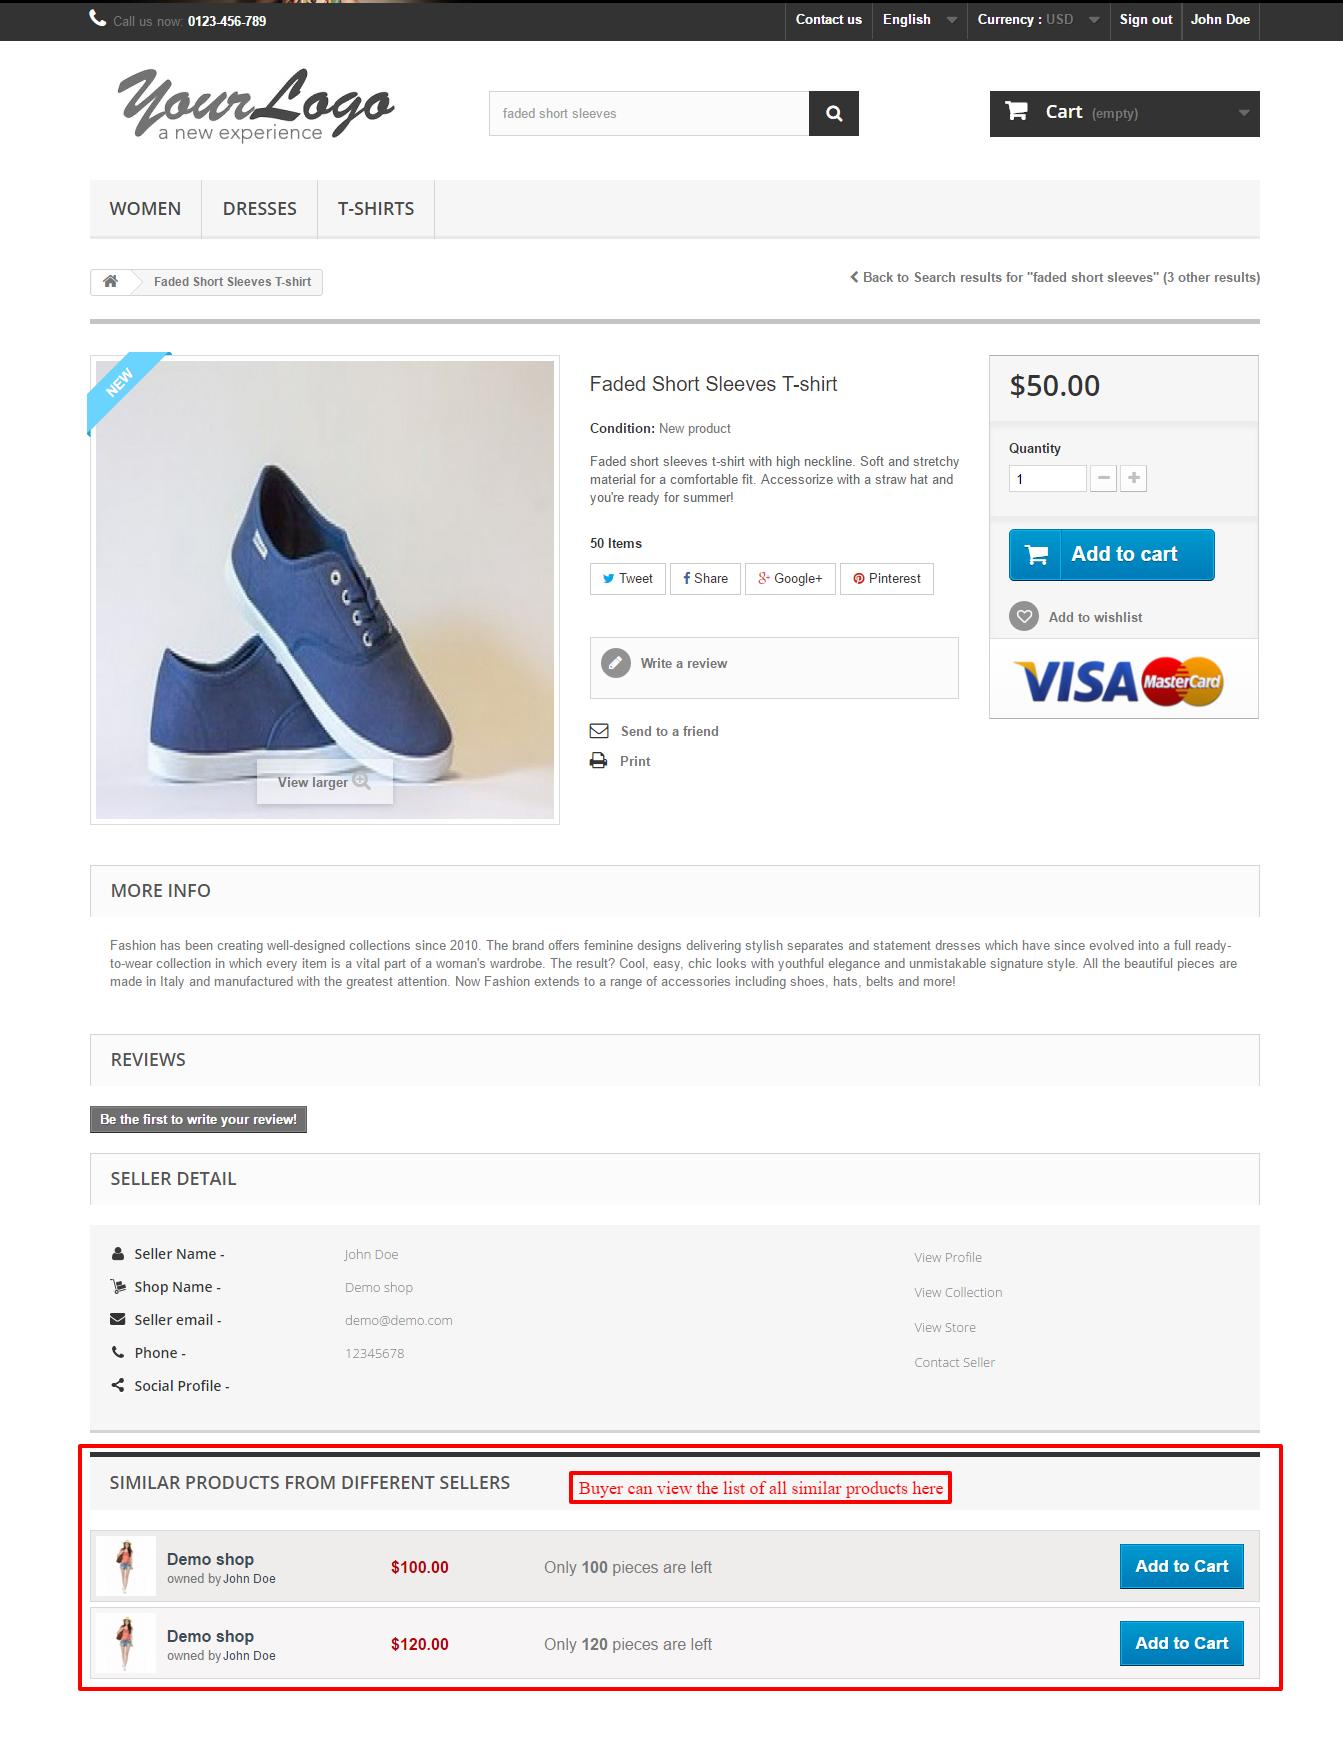 Prestashop B2B Marketplace | Online B2B Marketplace